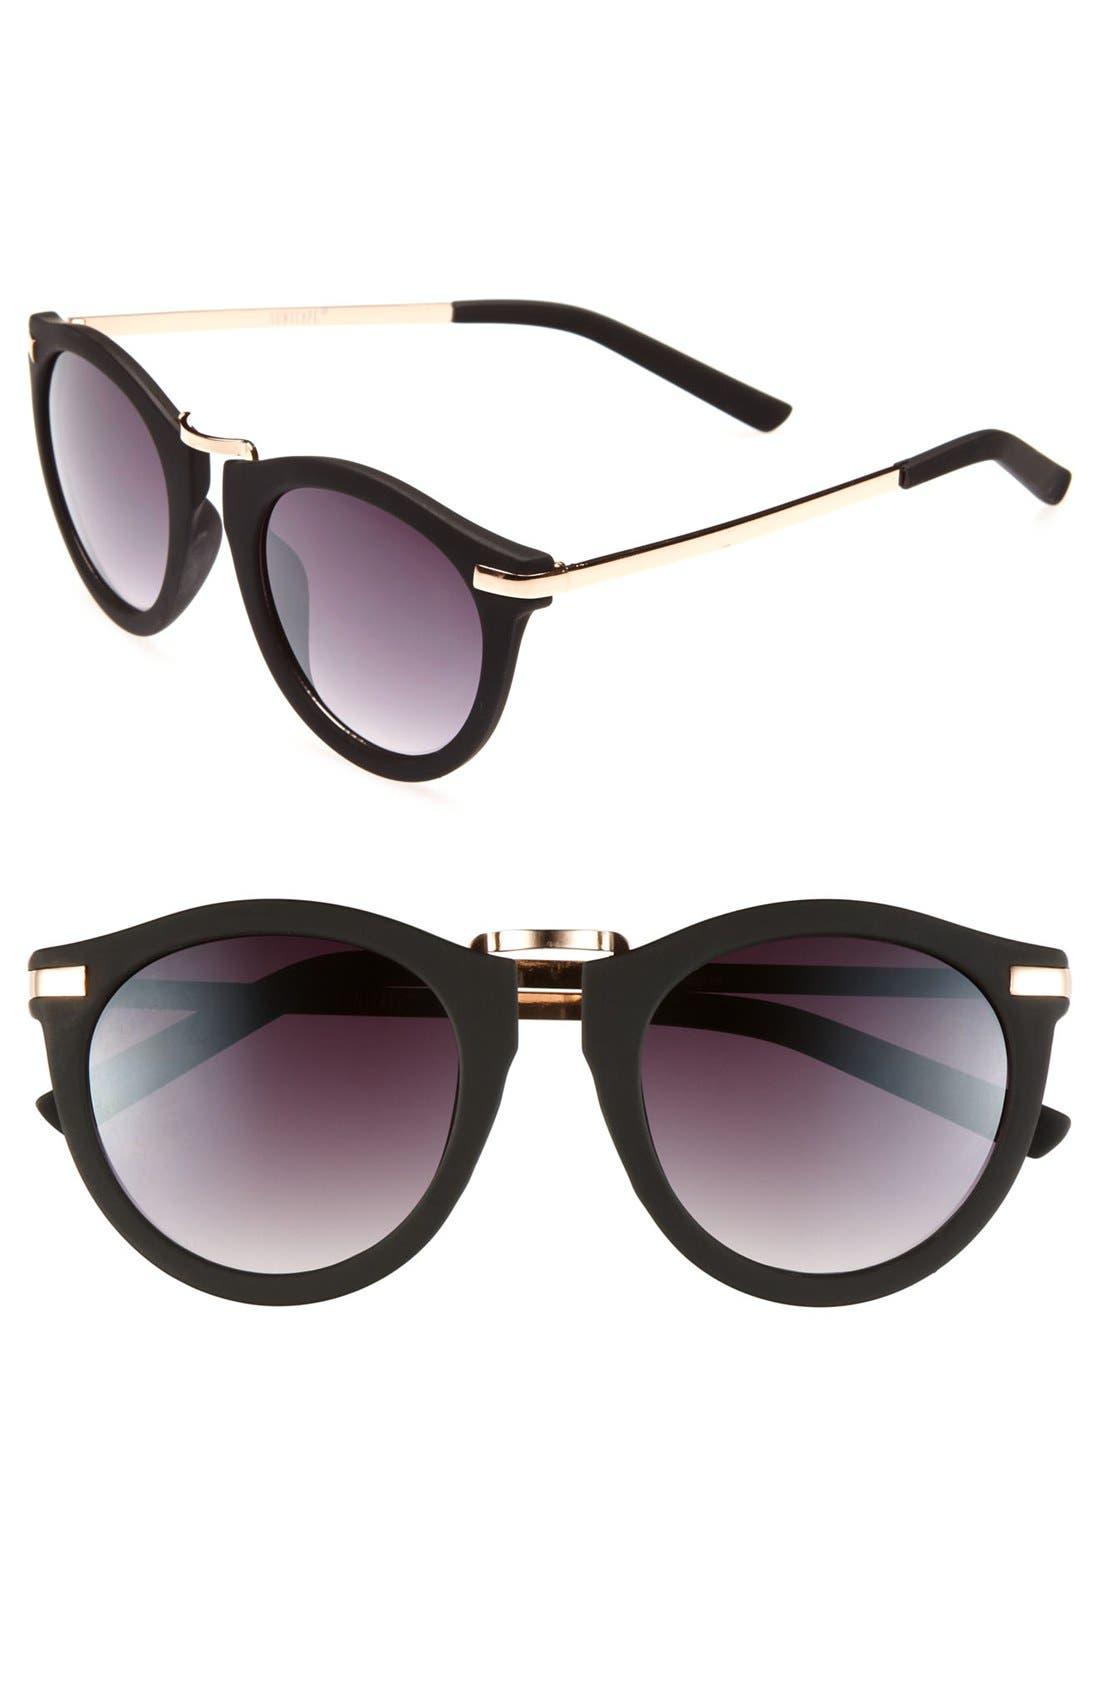 Alternate Image 1 Selected - BP. Round Retro Sunglasses